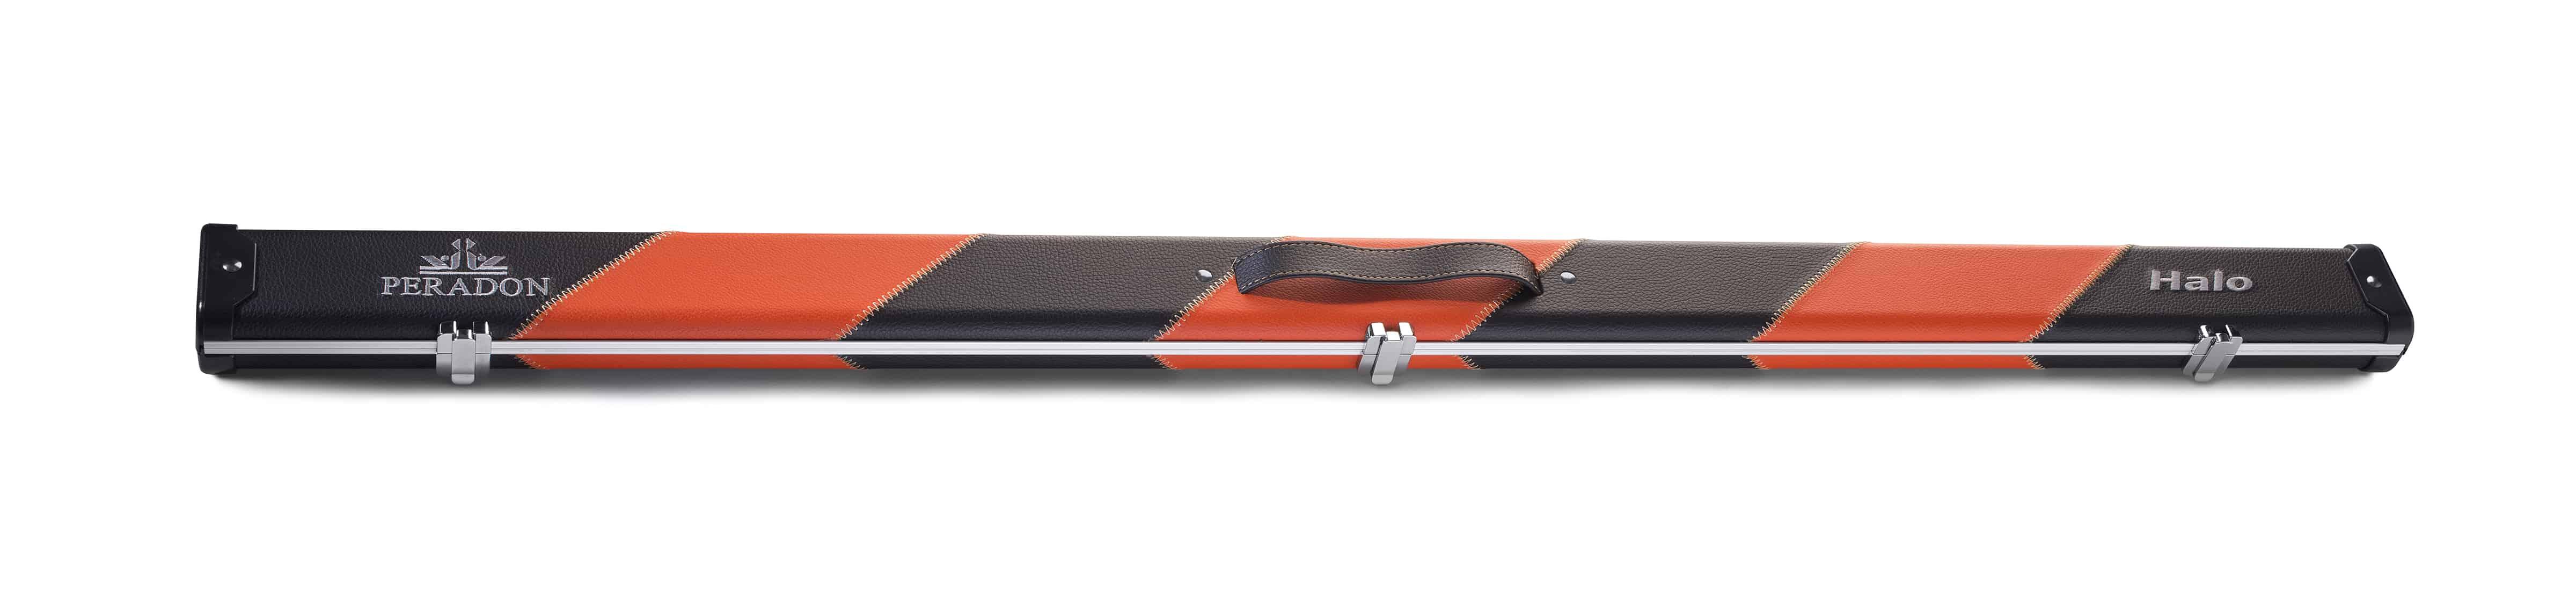 Peradon Halo Black Orange Stripe ¾ Snooker Cue Case